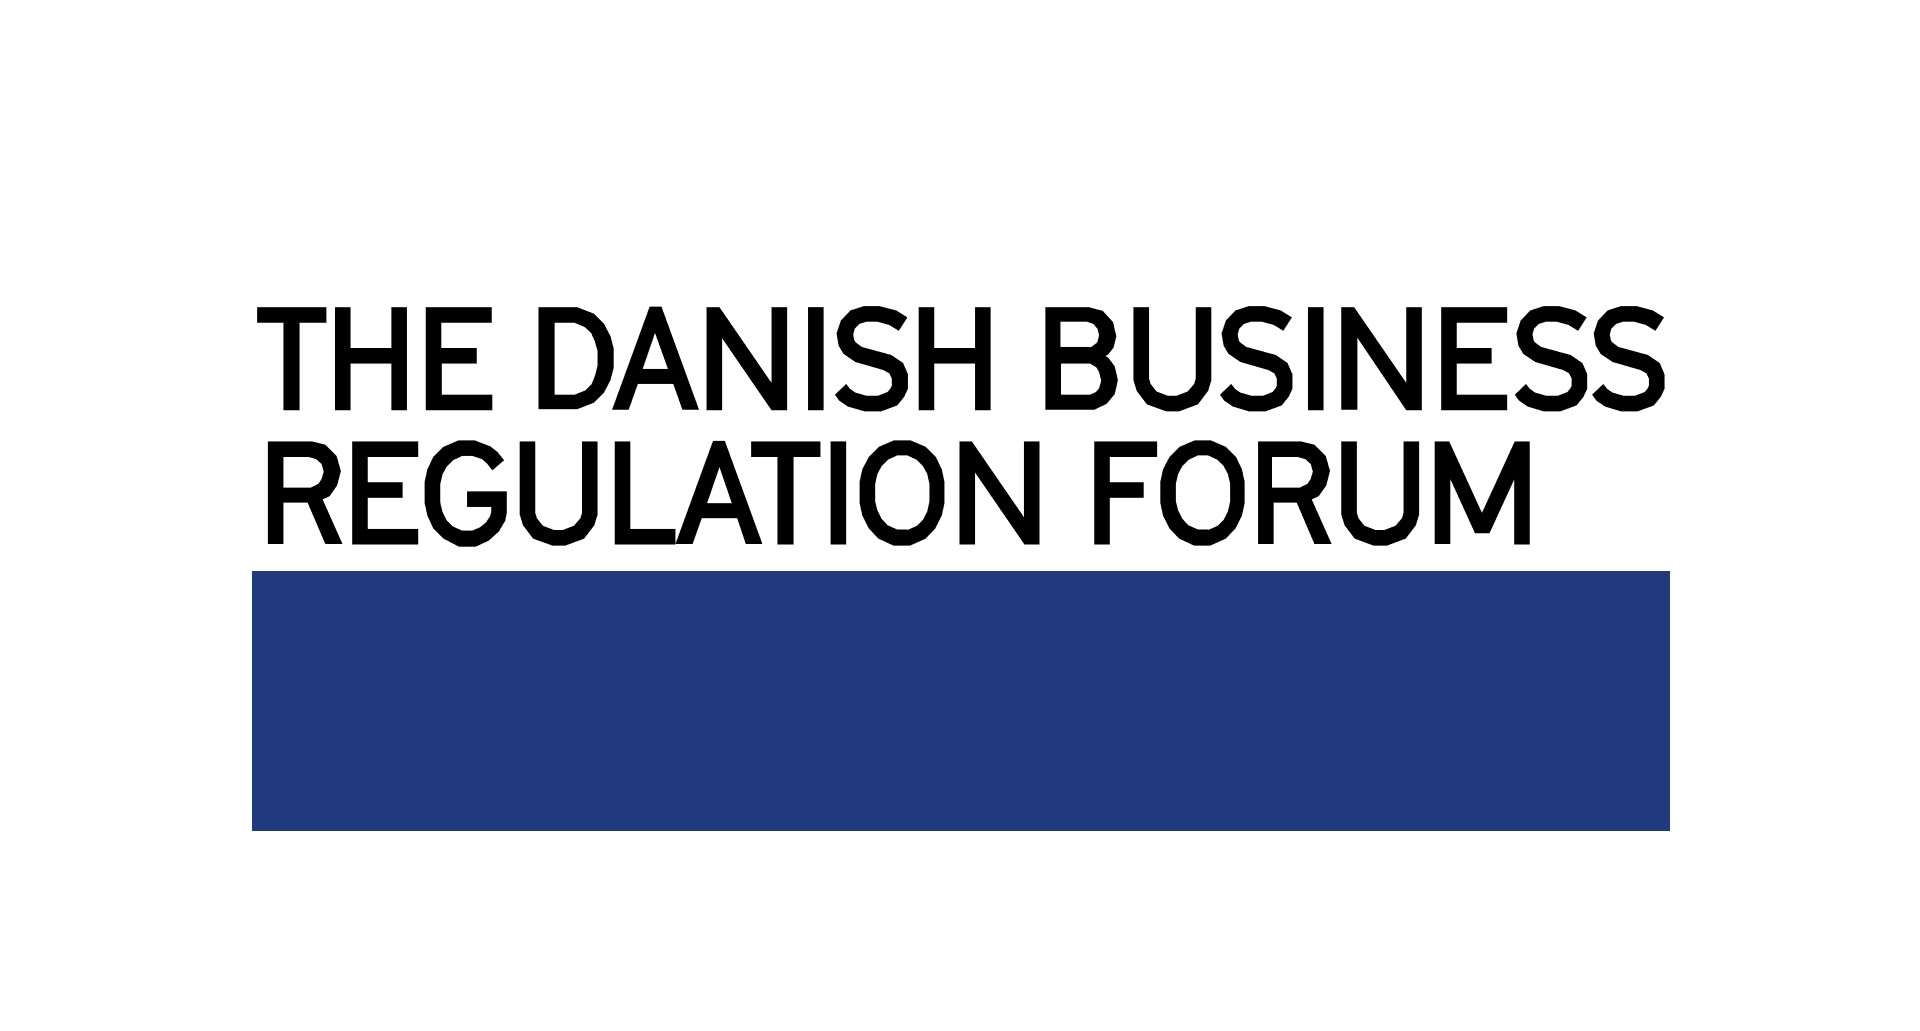 danish business regulation forum logo